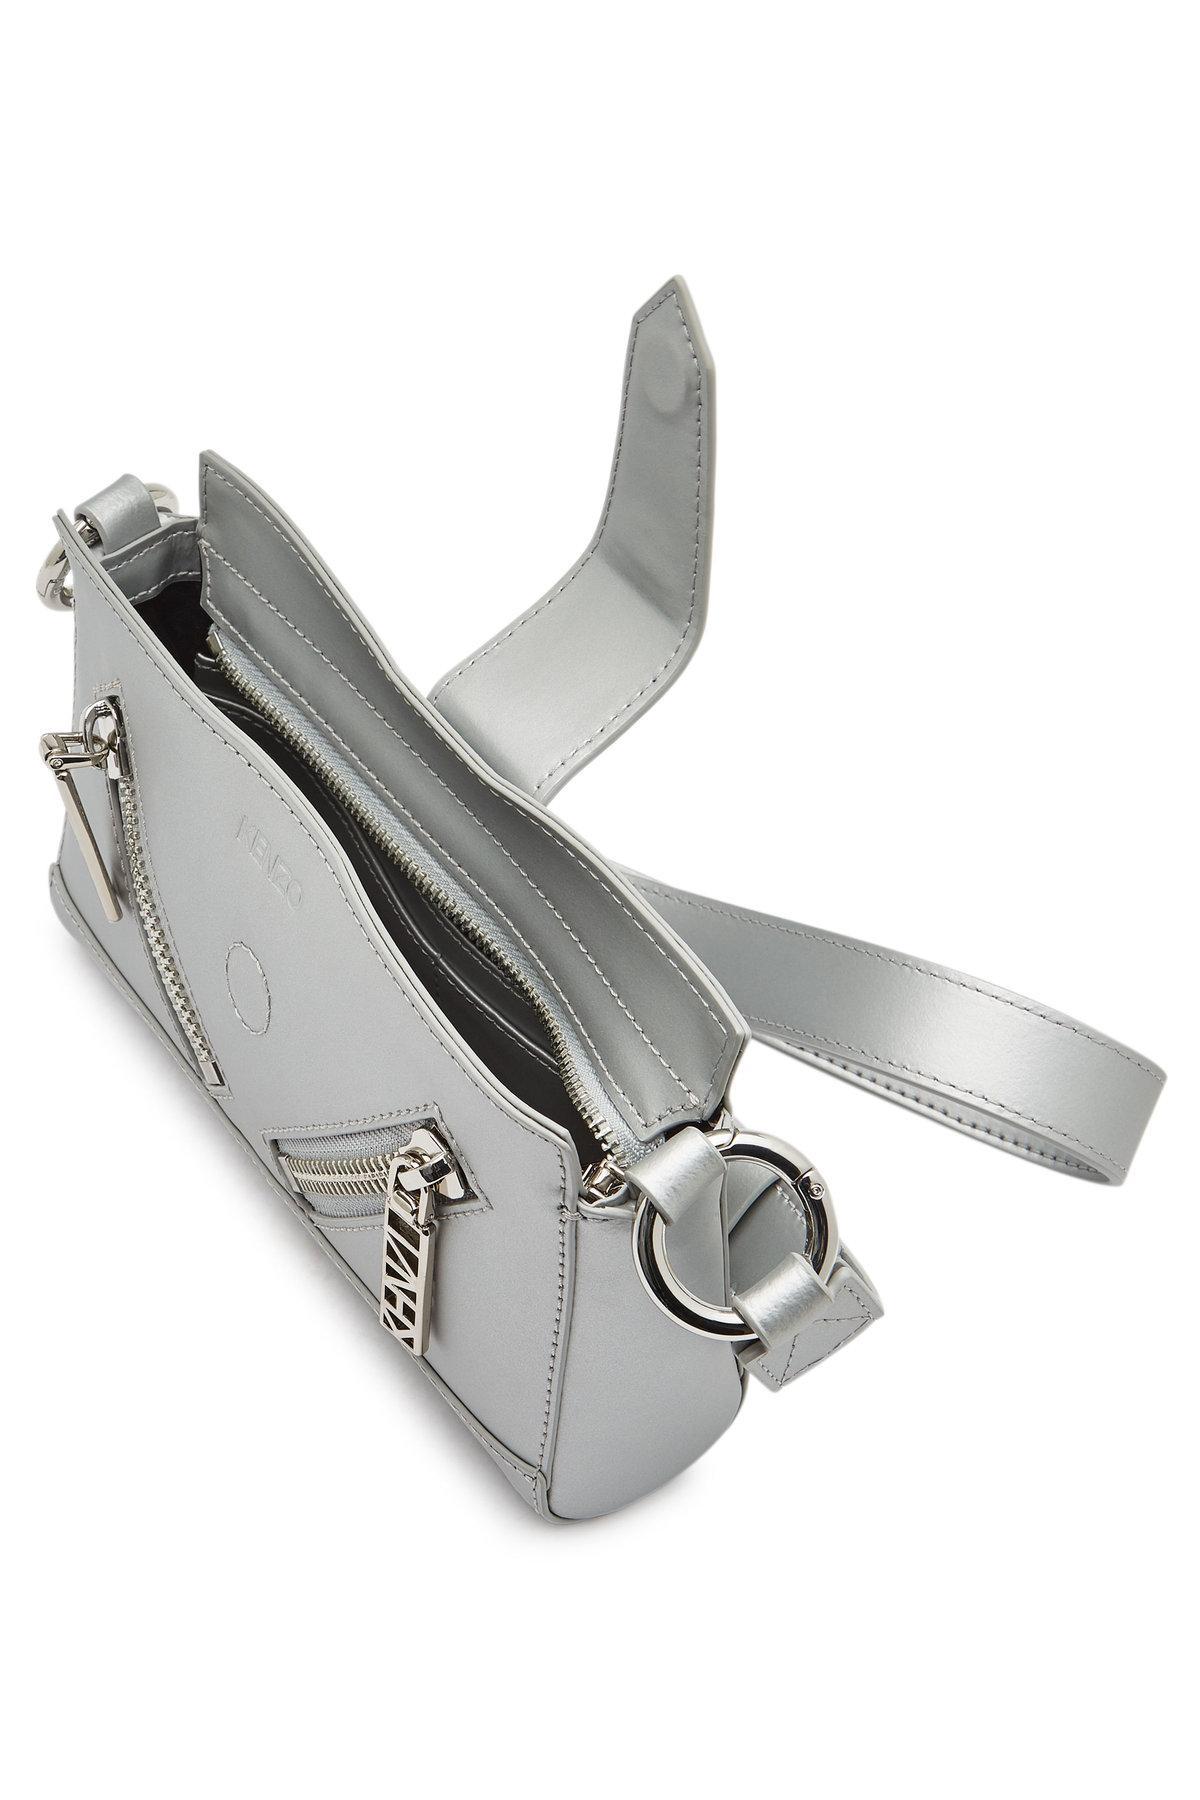 d28b2571ca KENZO Baby California Leather Shoulder Bag - Lyst